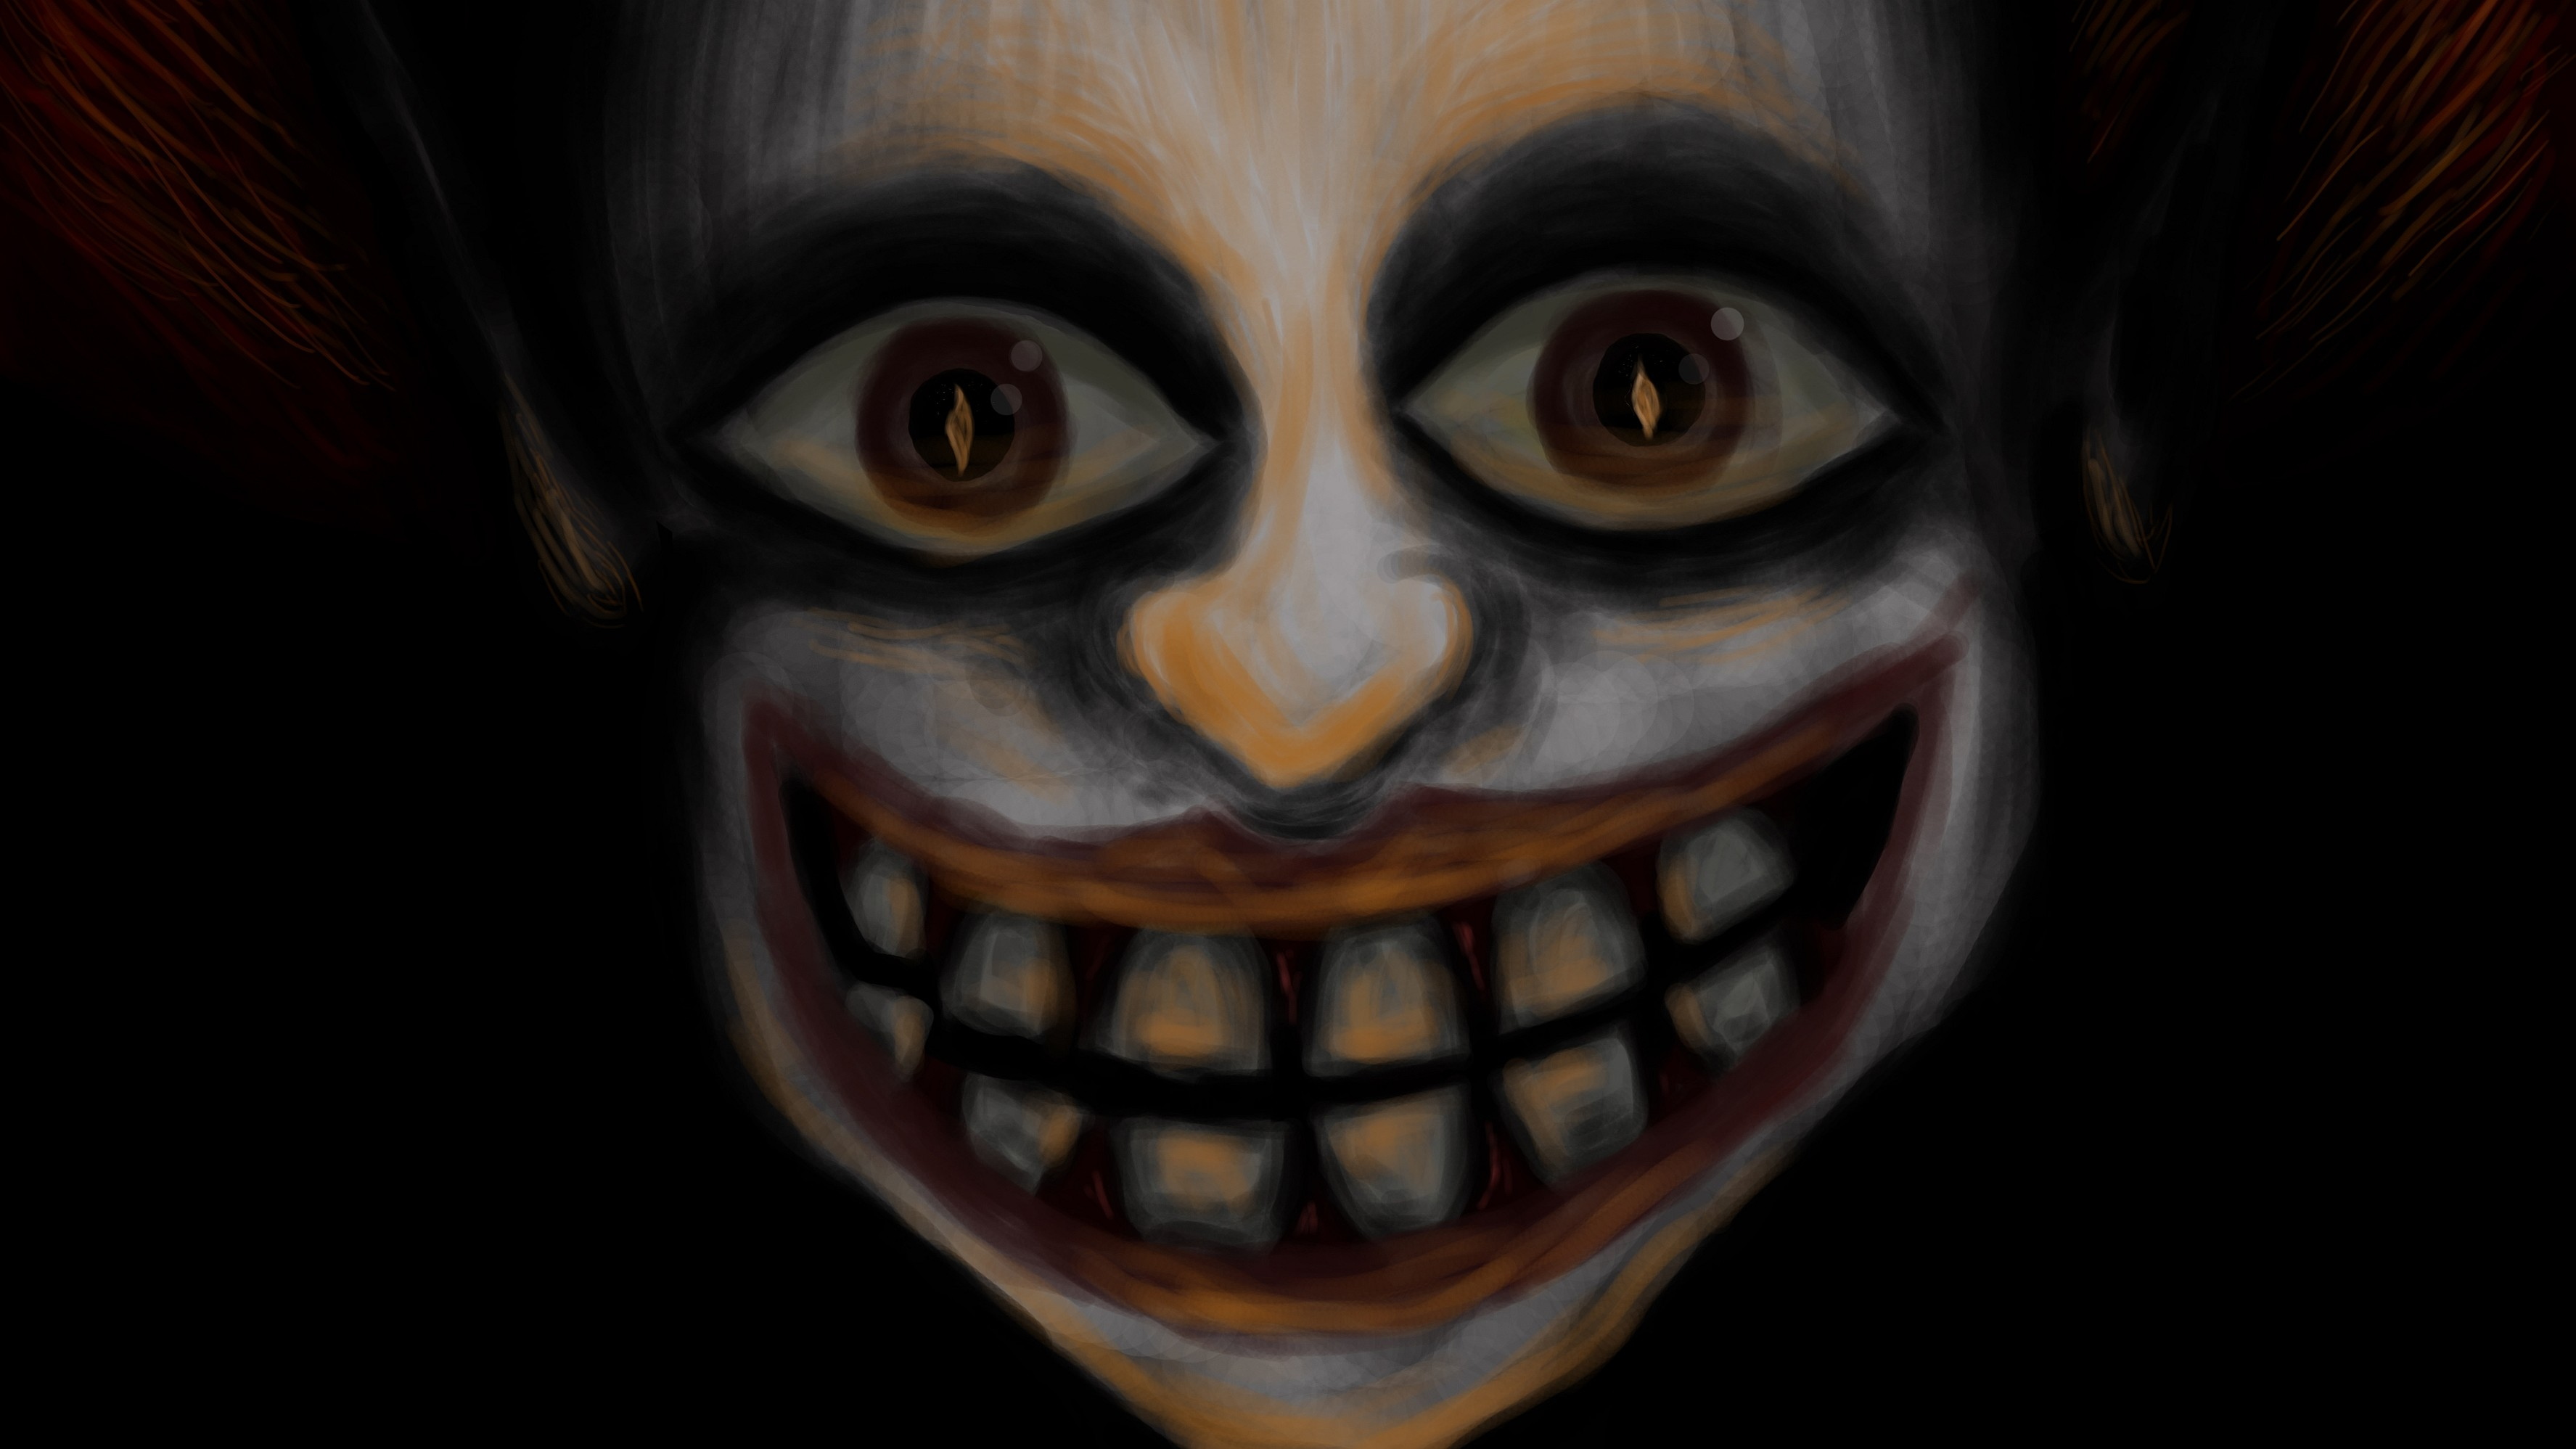 HD Wallpaper   Background ID:564627. Dark Creepy